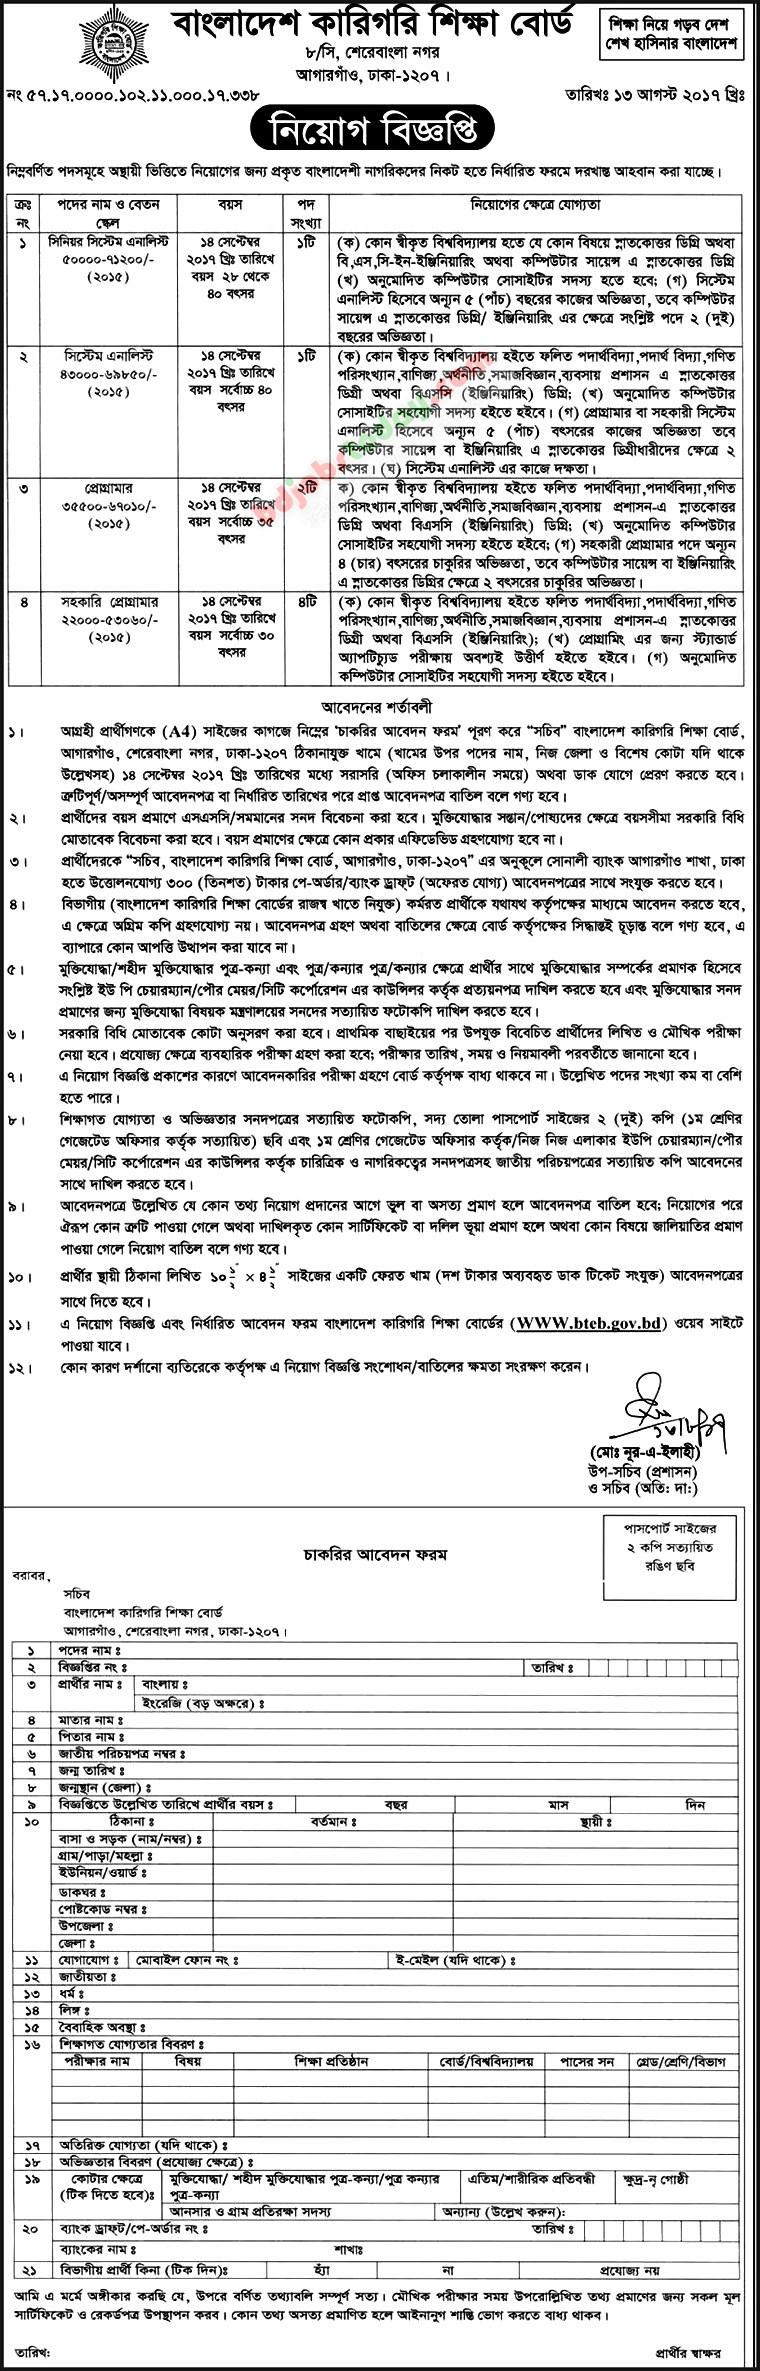 Bangladesh Technical Education Board, \